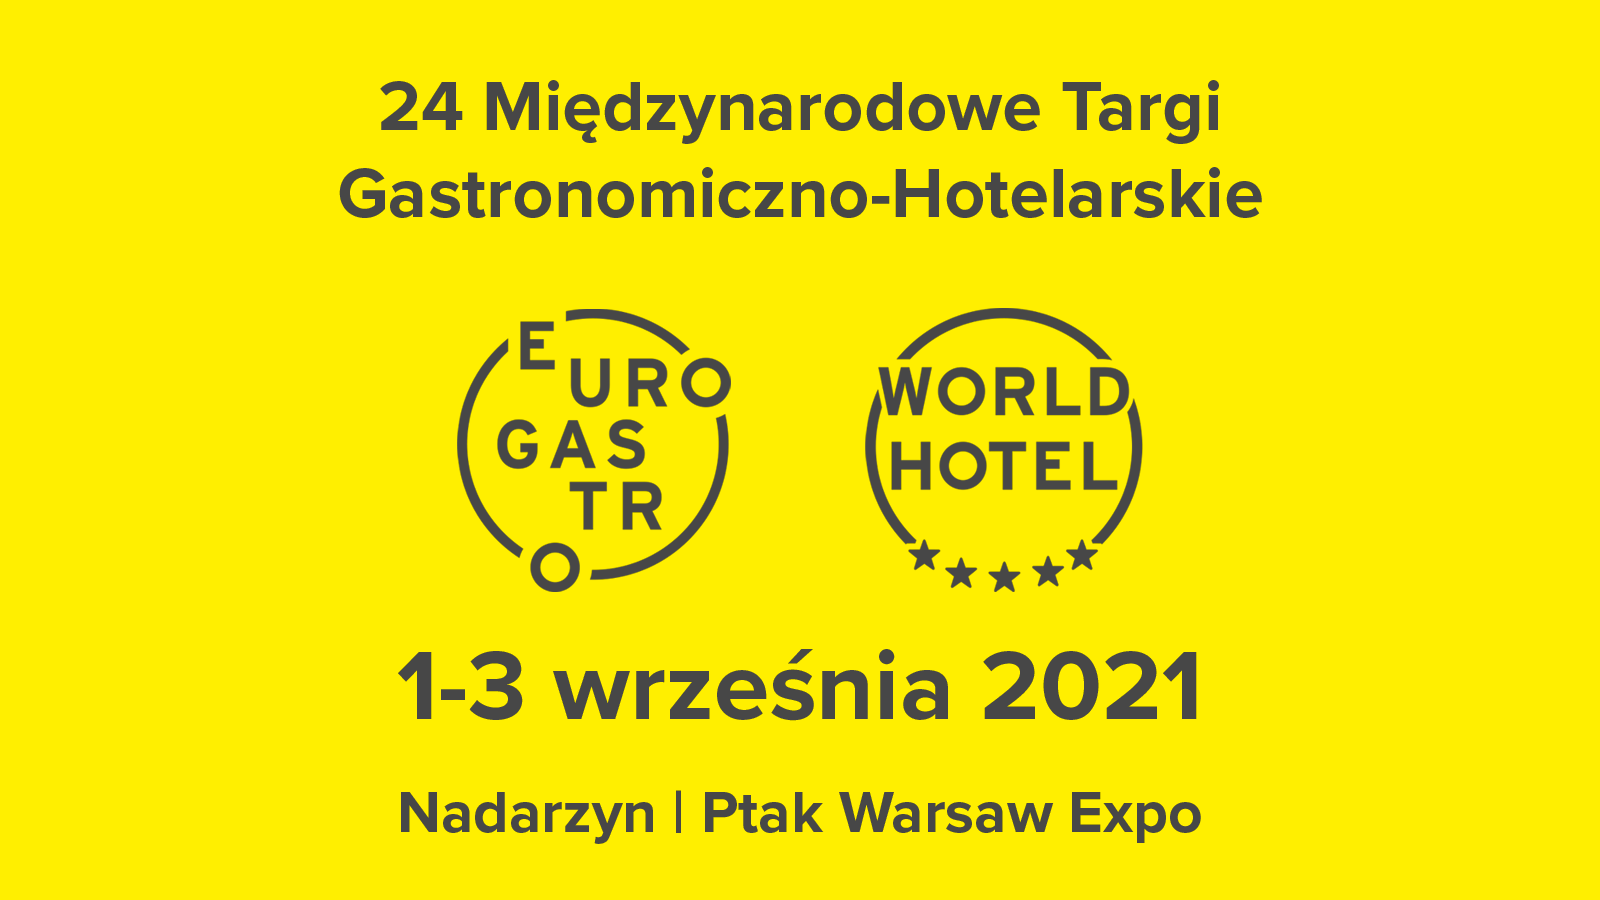 Targi EuroGastro 2021 | WorldHotel 2021